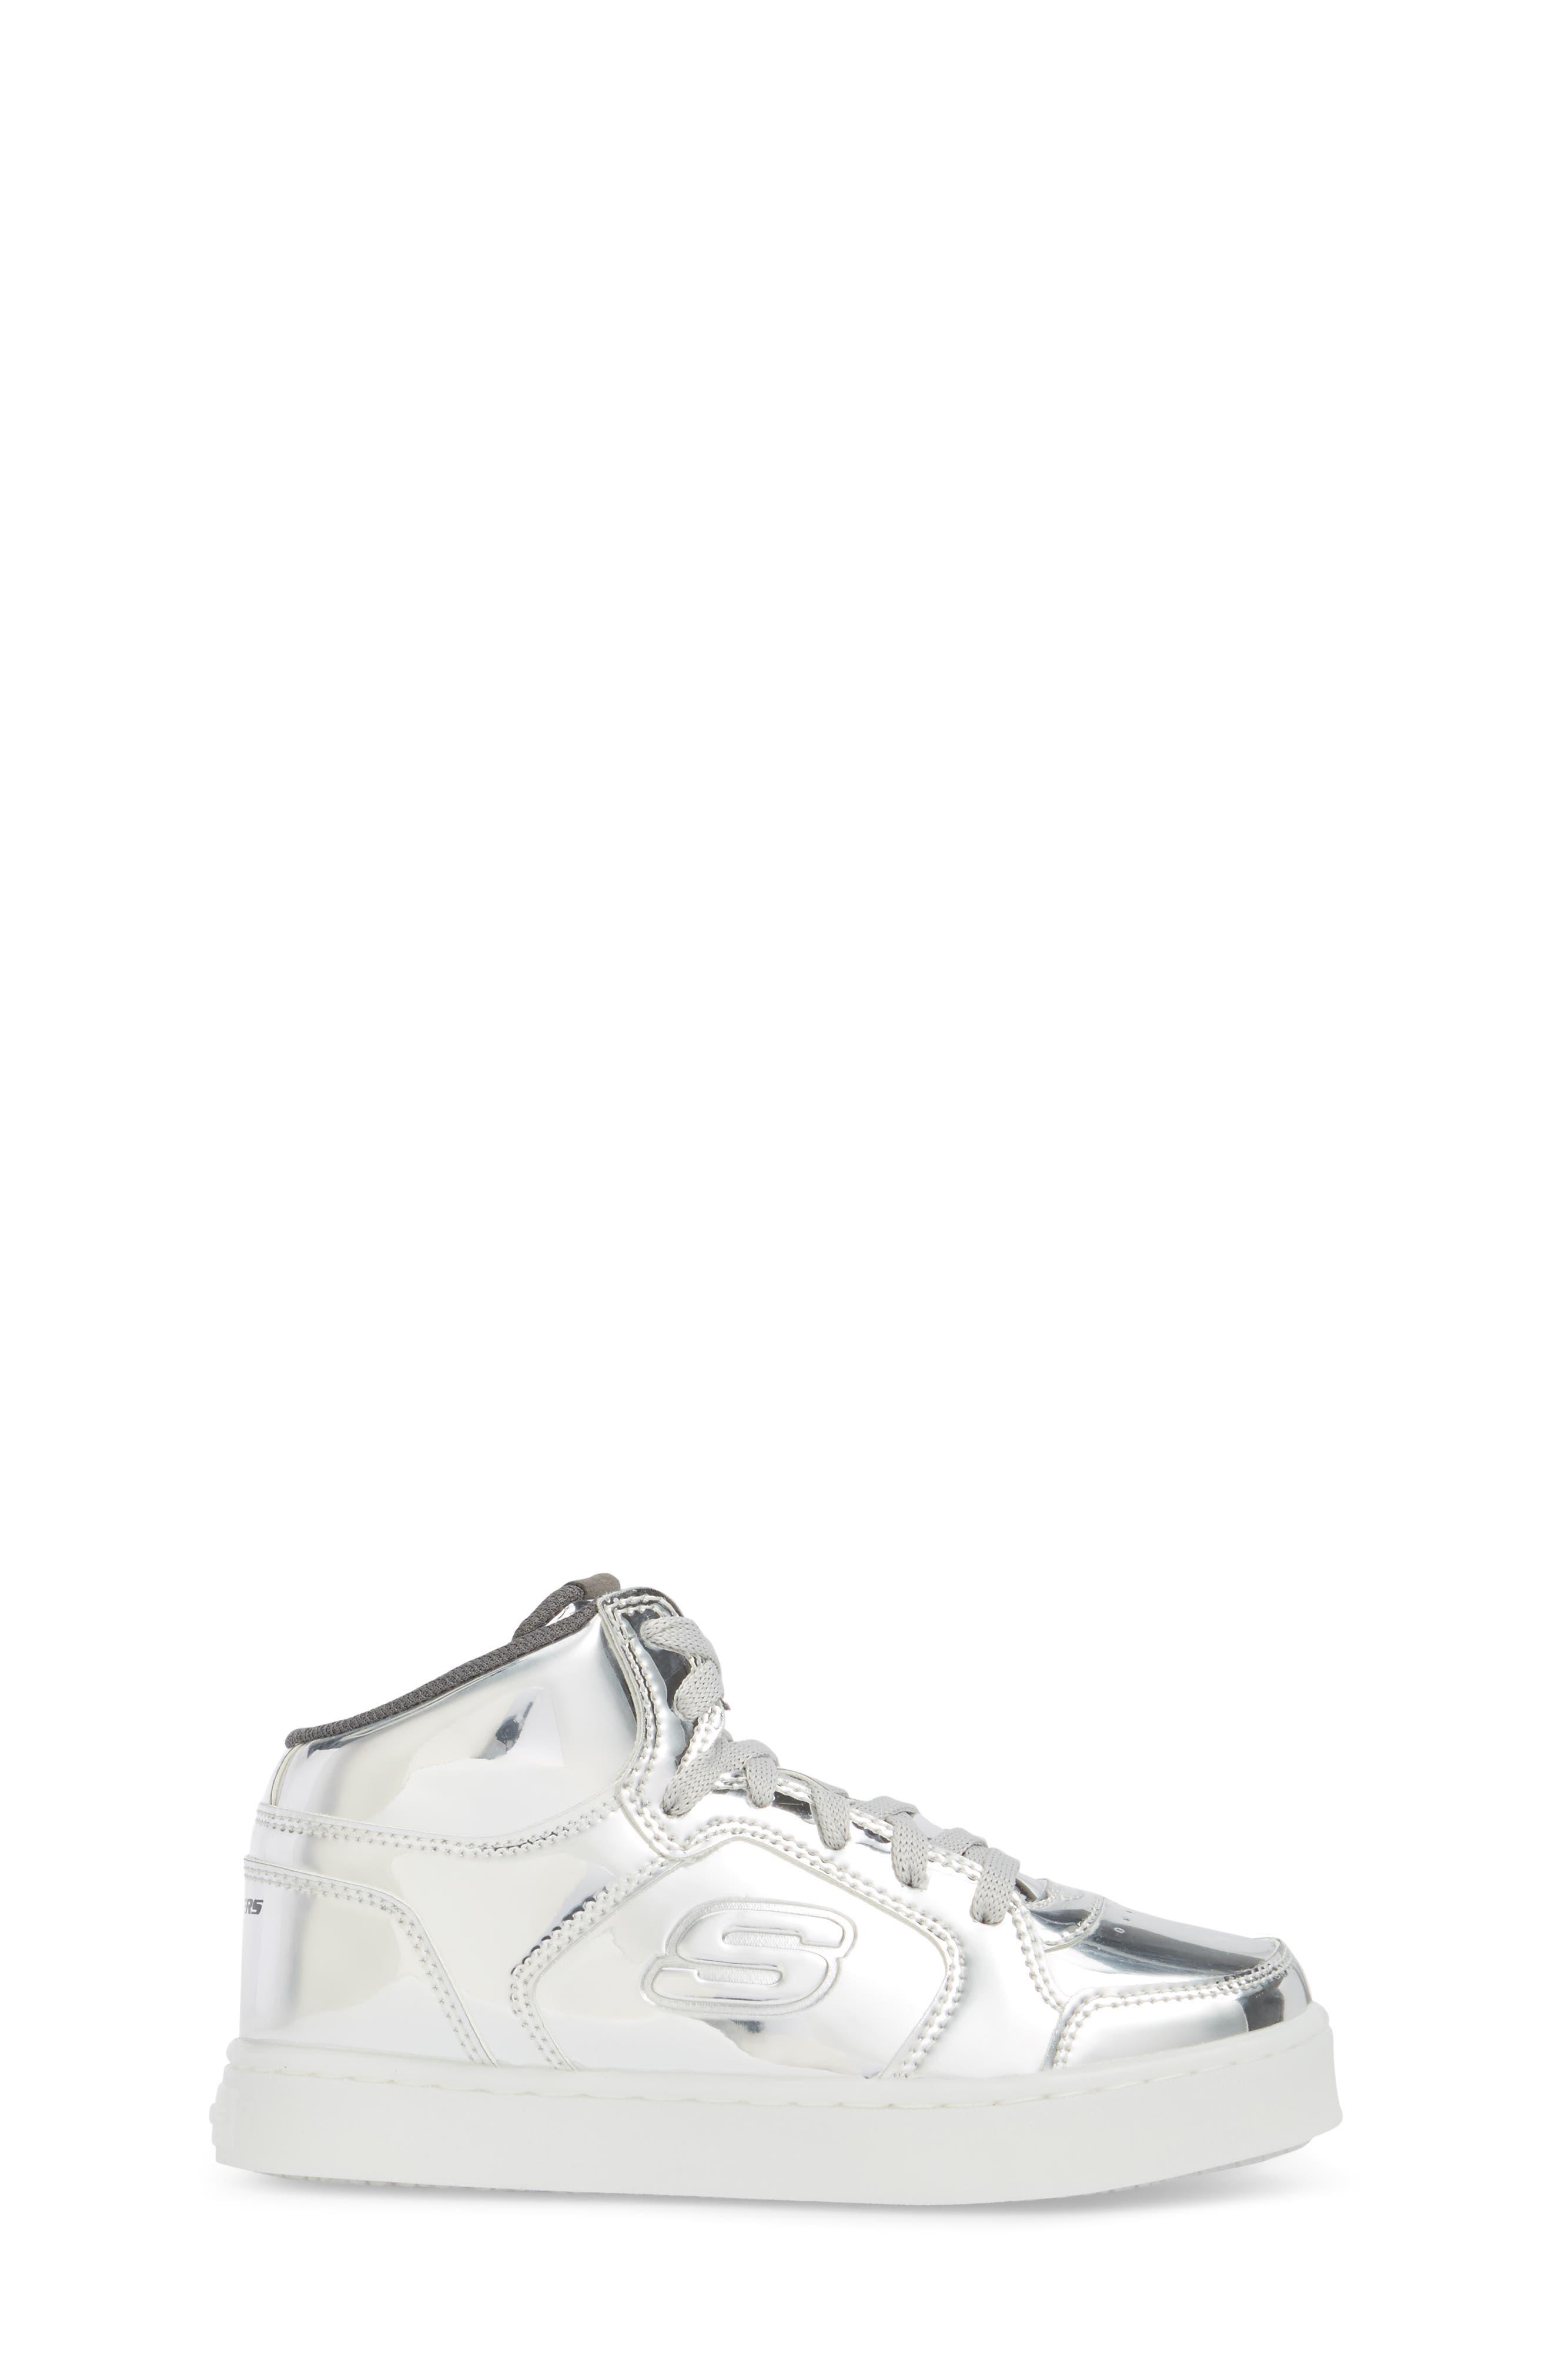 Energy Lights Metallic High Top Sneaker,                             Alternate thumbnail 9, color,